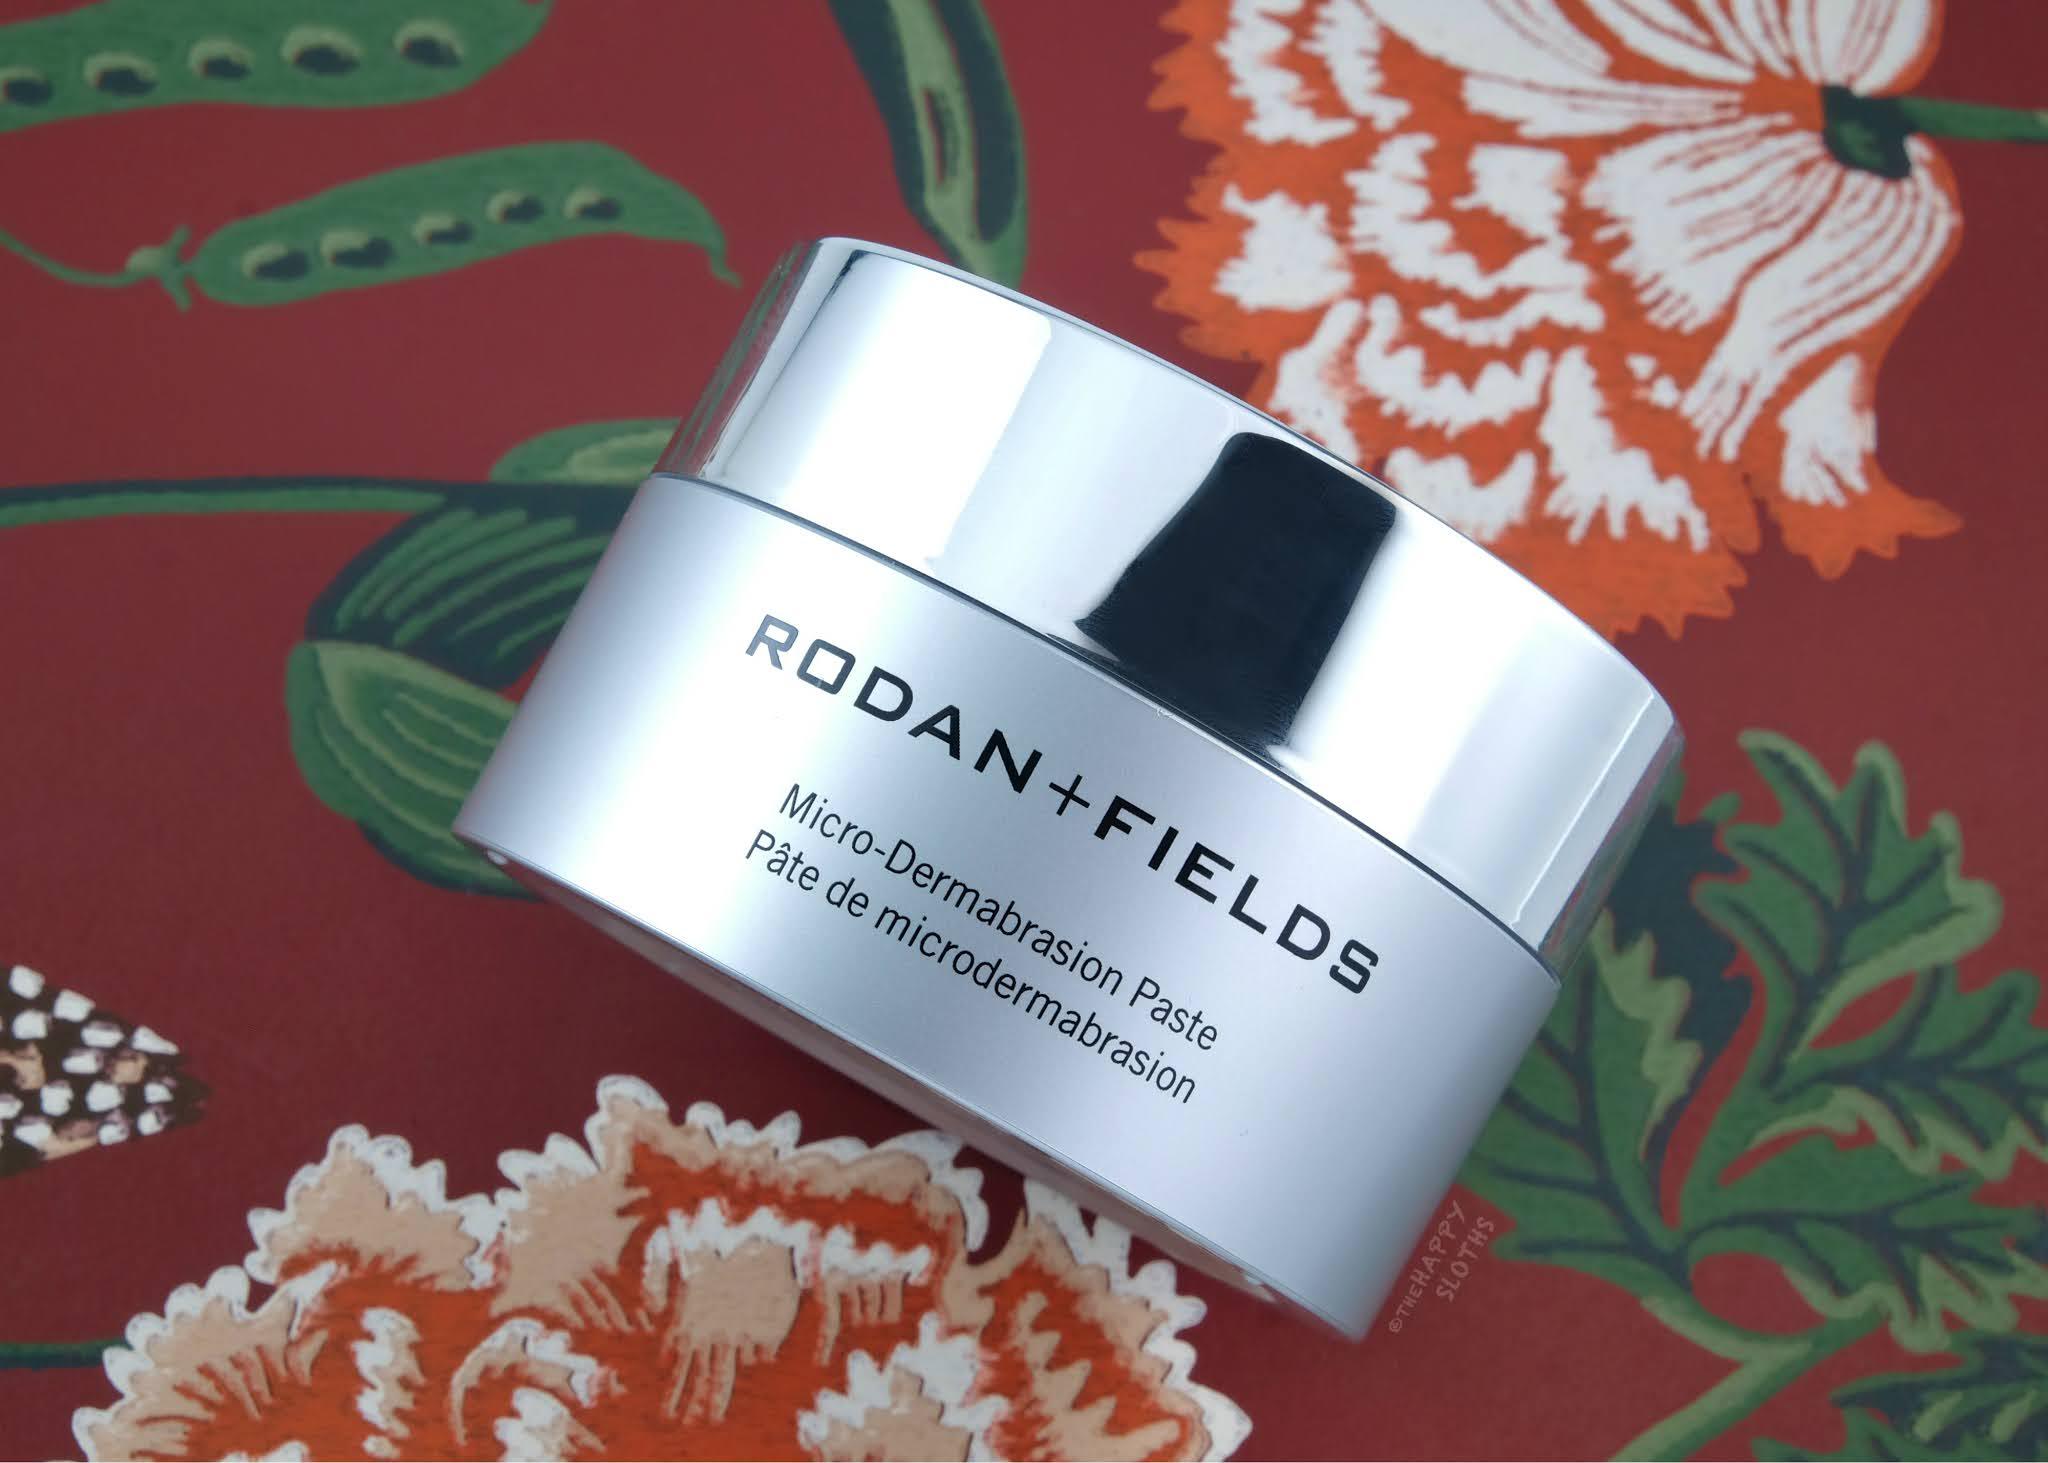 Rodan + Fields | Micro-Dermabrasion Paste: Review